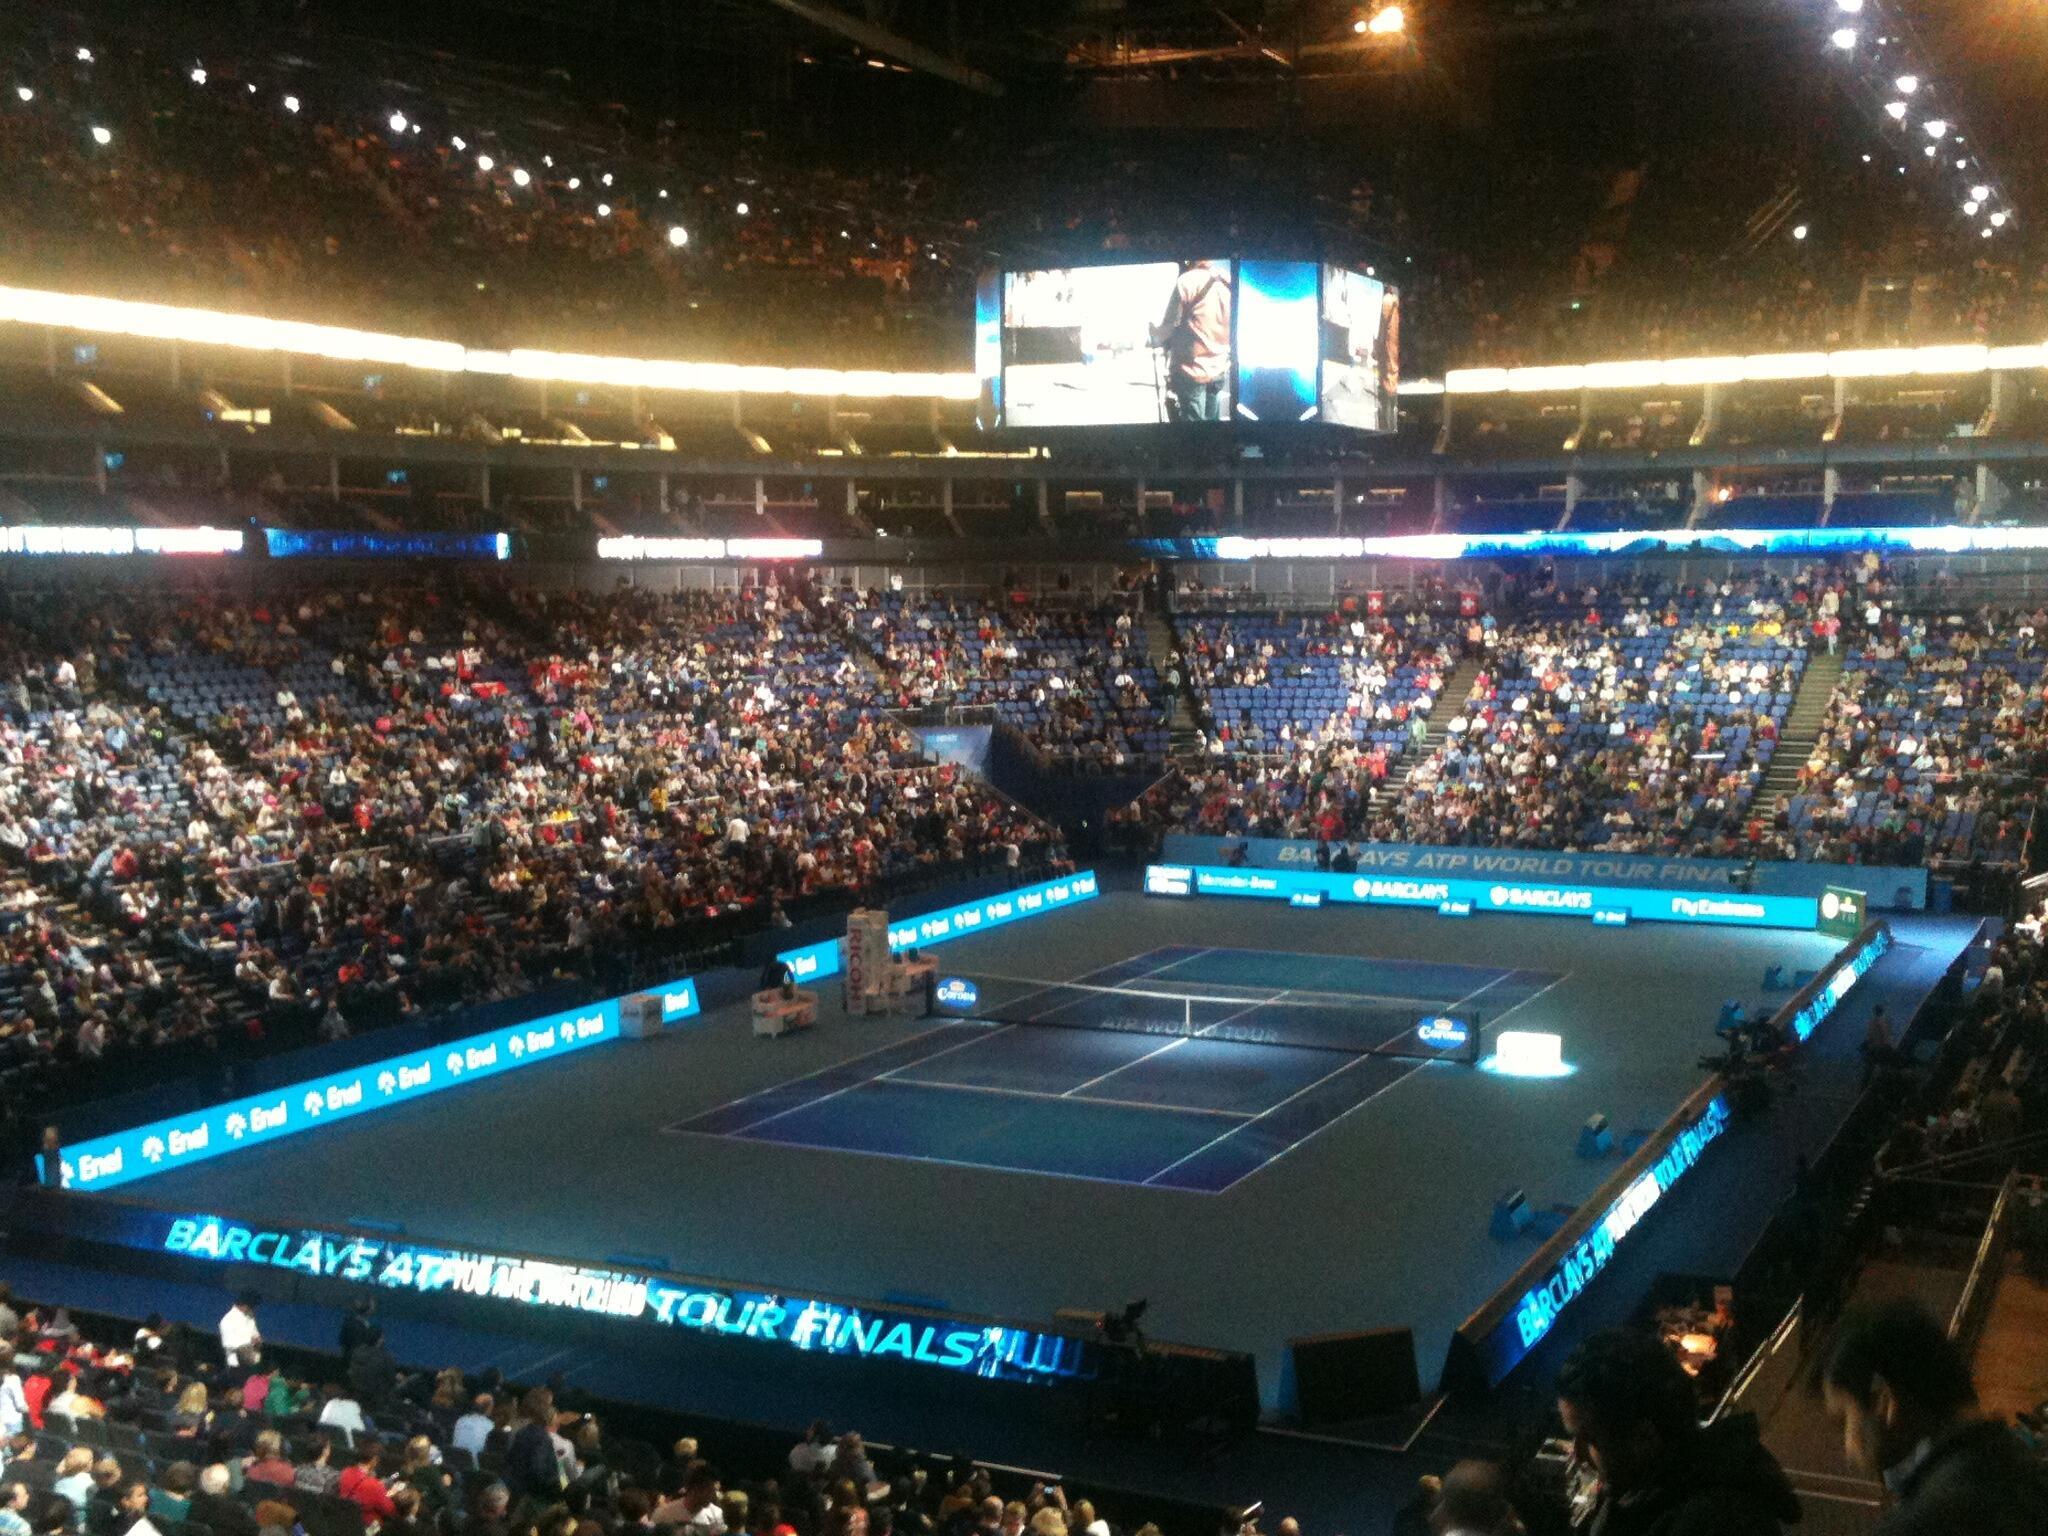 Atmosphere building for @rogerfederer v @DjokerNole at #ATP World Tour Finals. Who are you backing? #FinalShowdown http://t.co/Hs6Z0Fnx7M